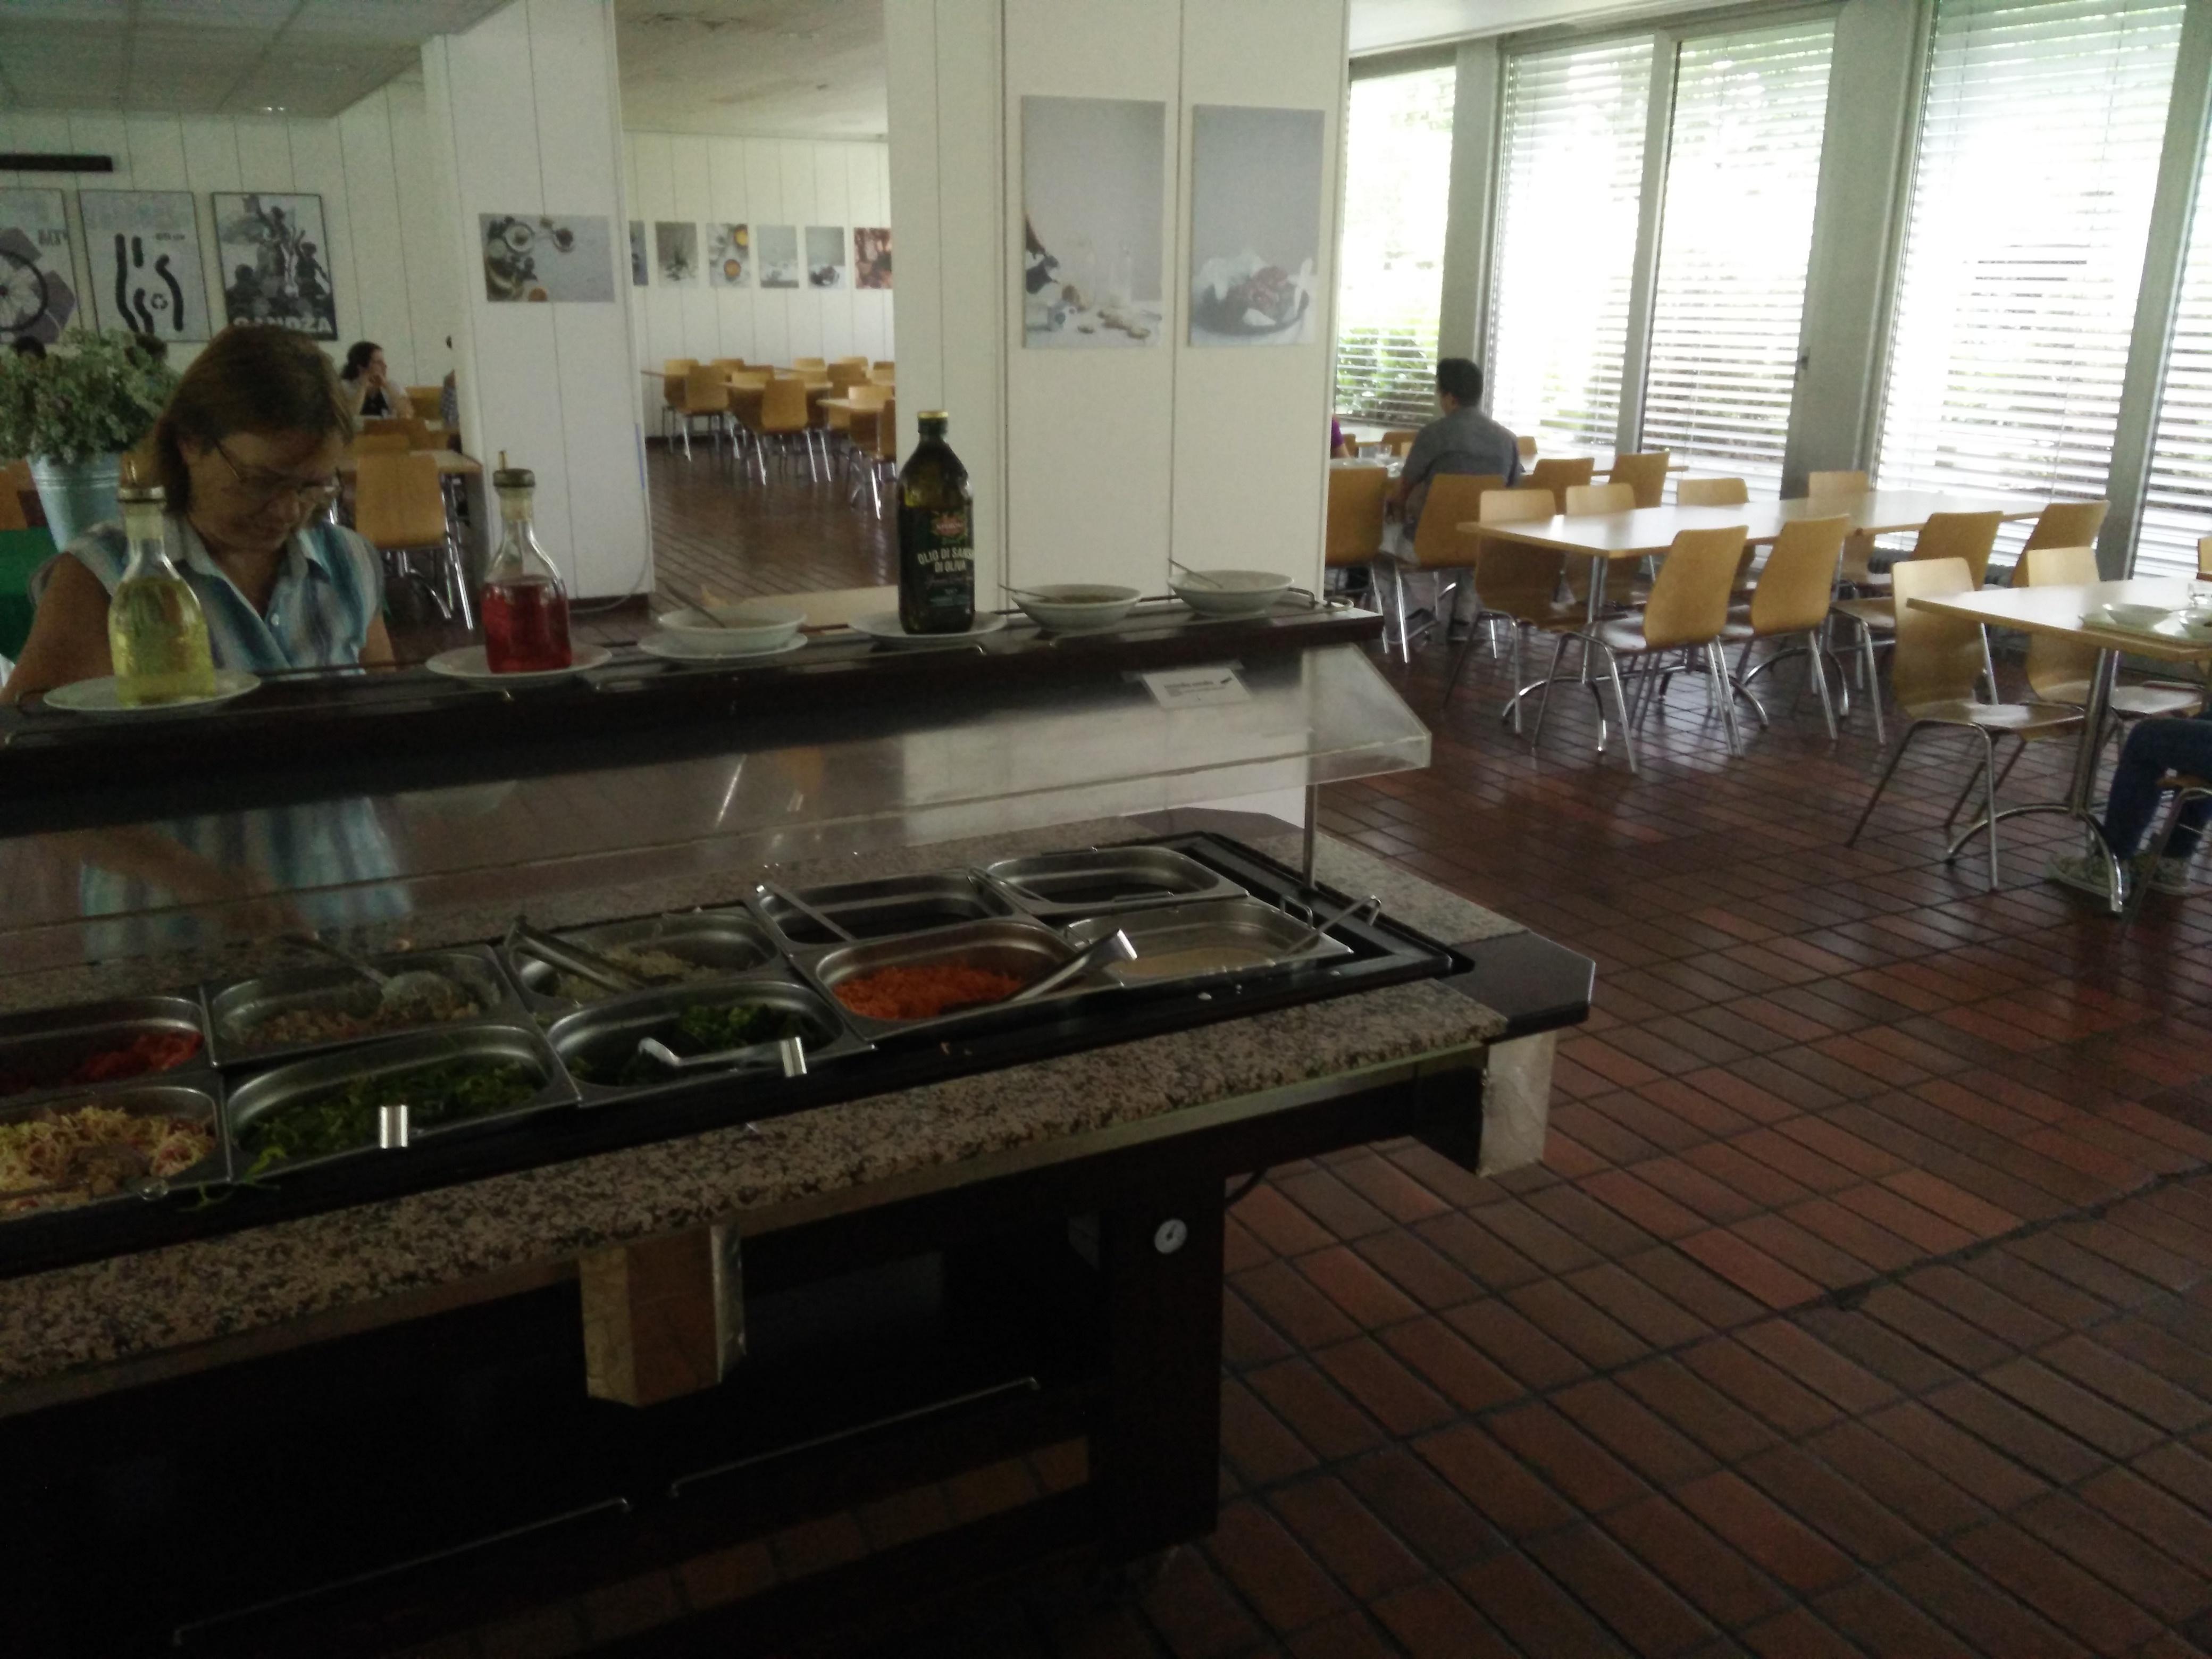 Dining room on ground floor.